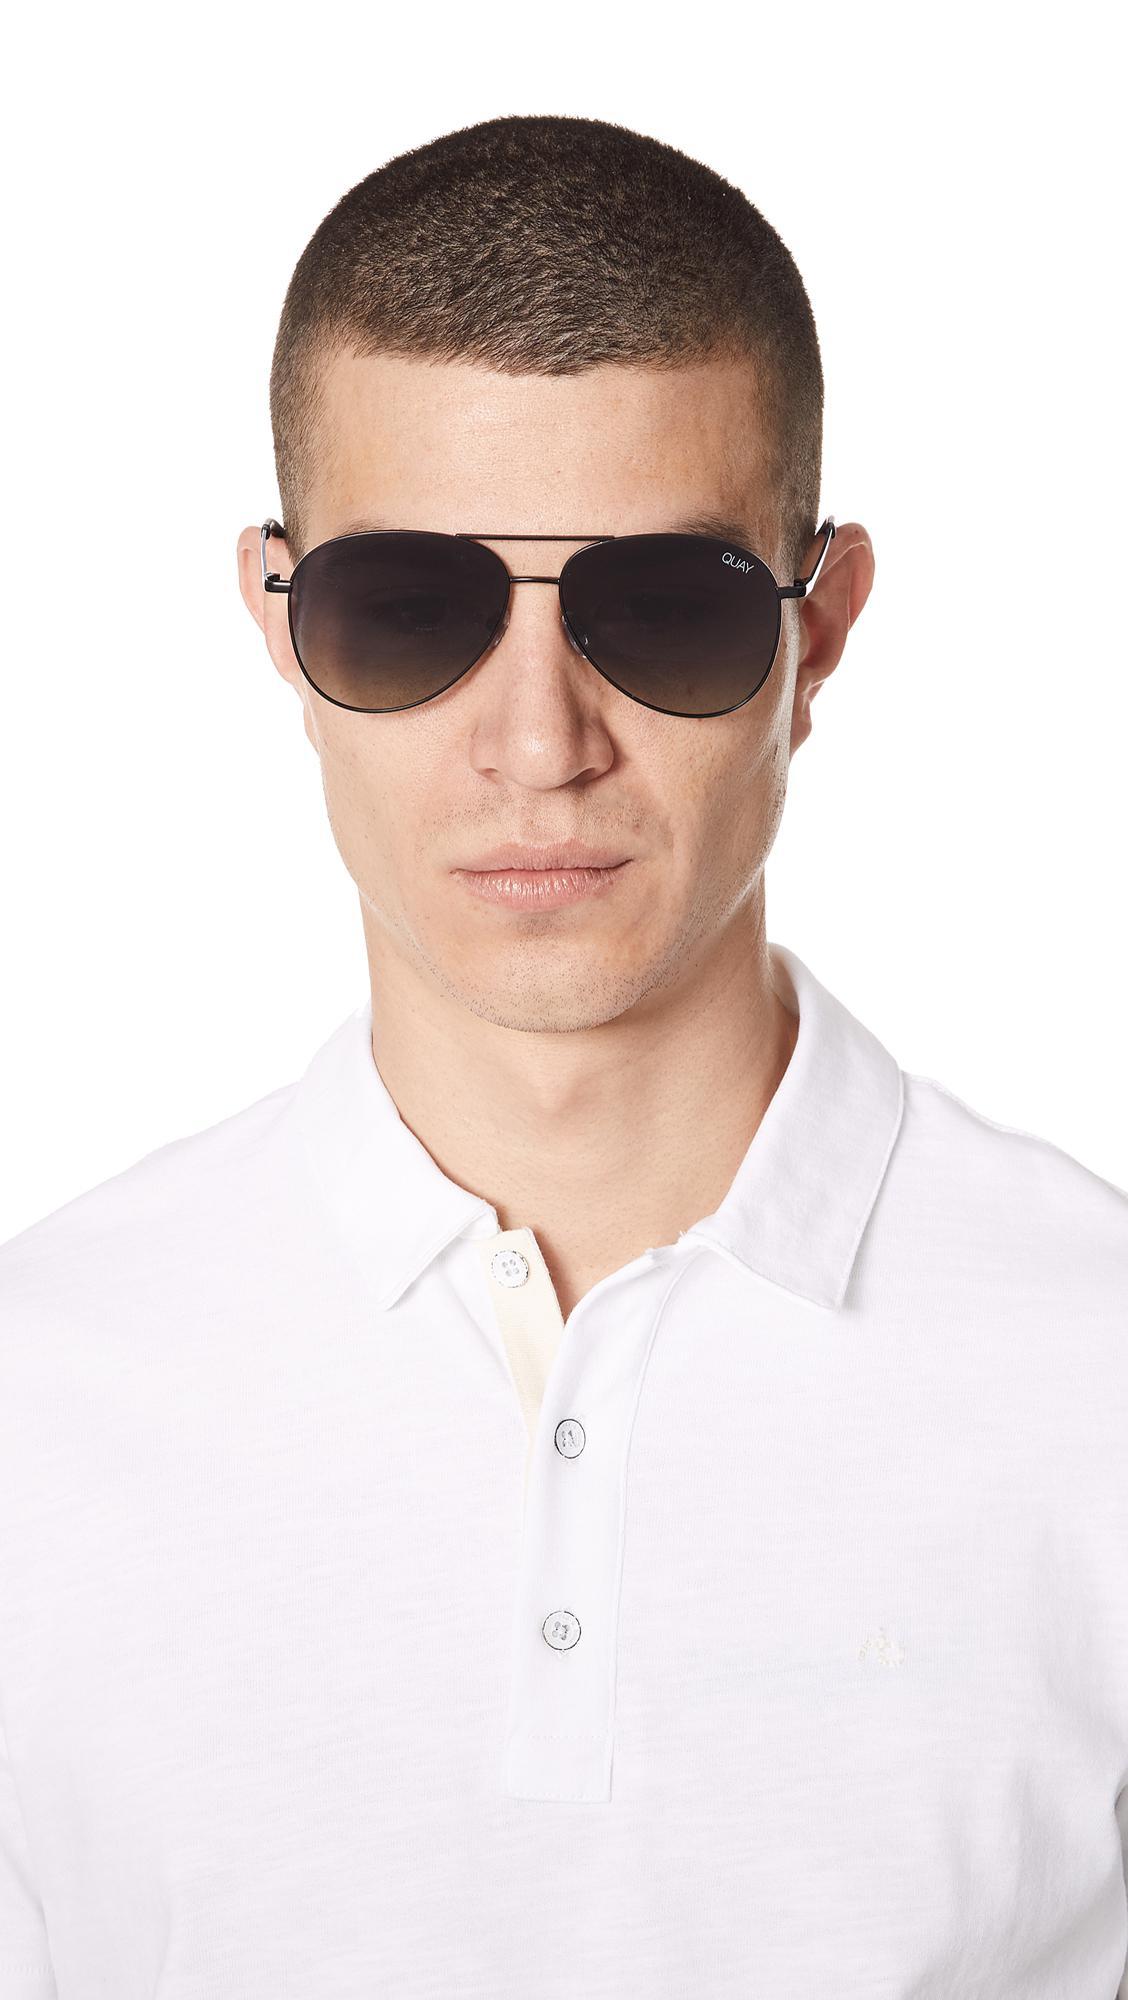 6a9b2899dc Quay - Black Still Standing Sunglasses for Men - Lyst. View fullscreen